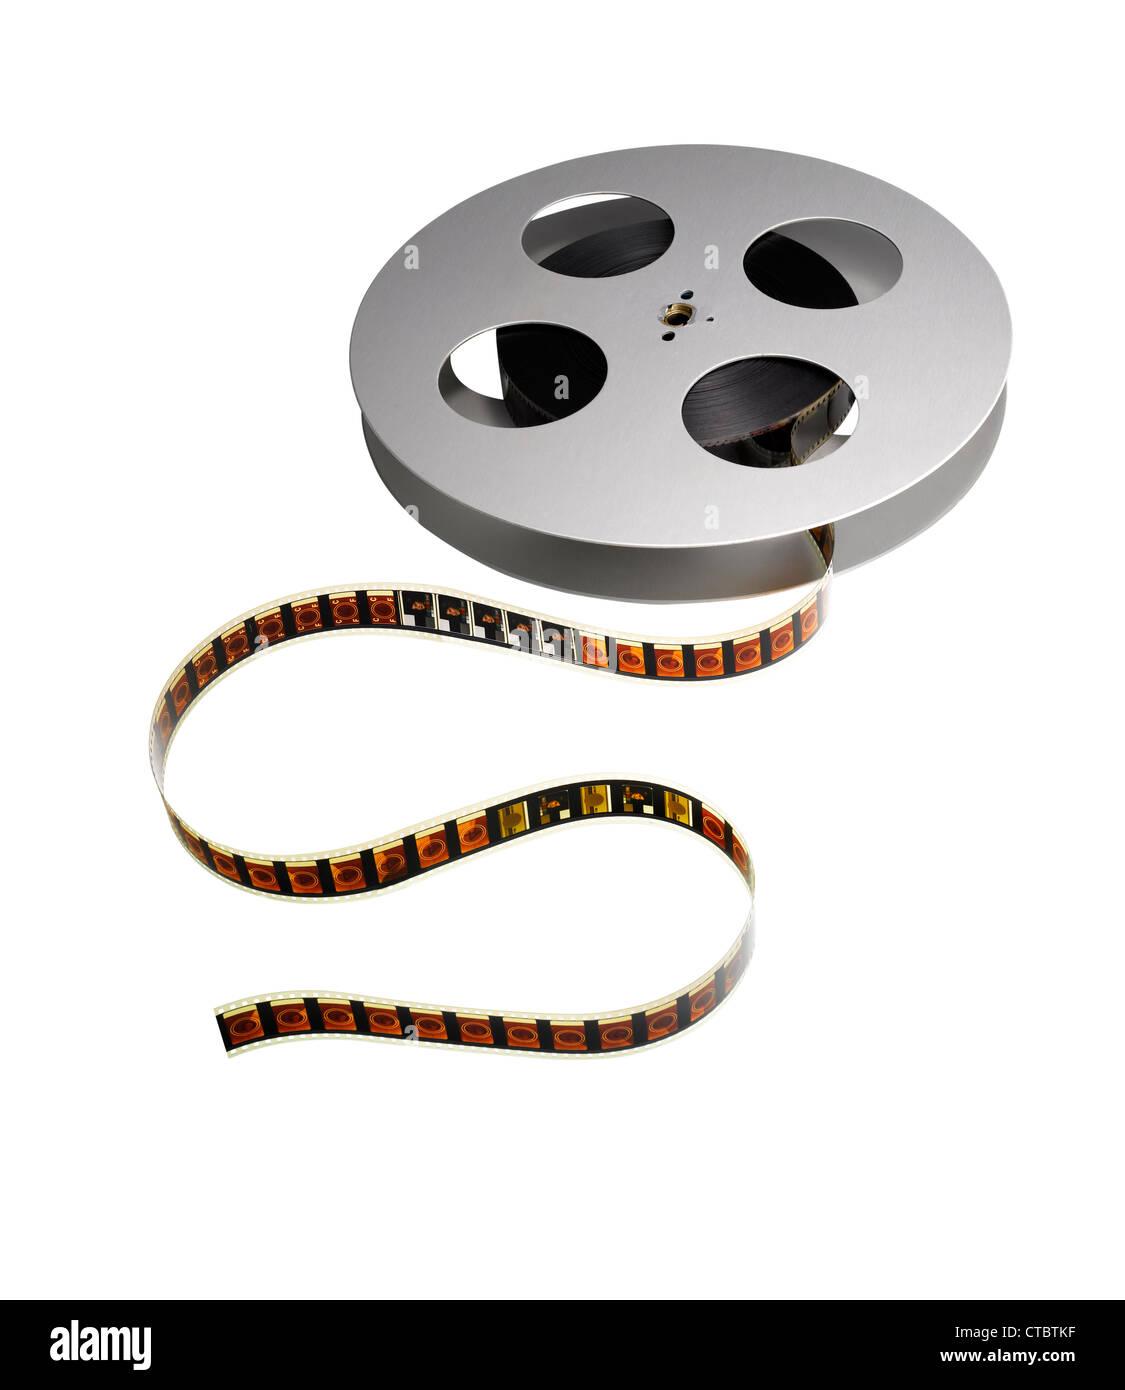 Un carrete de película tradicional de 35mm. Imagen De Stock